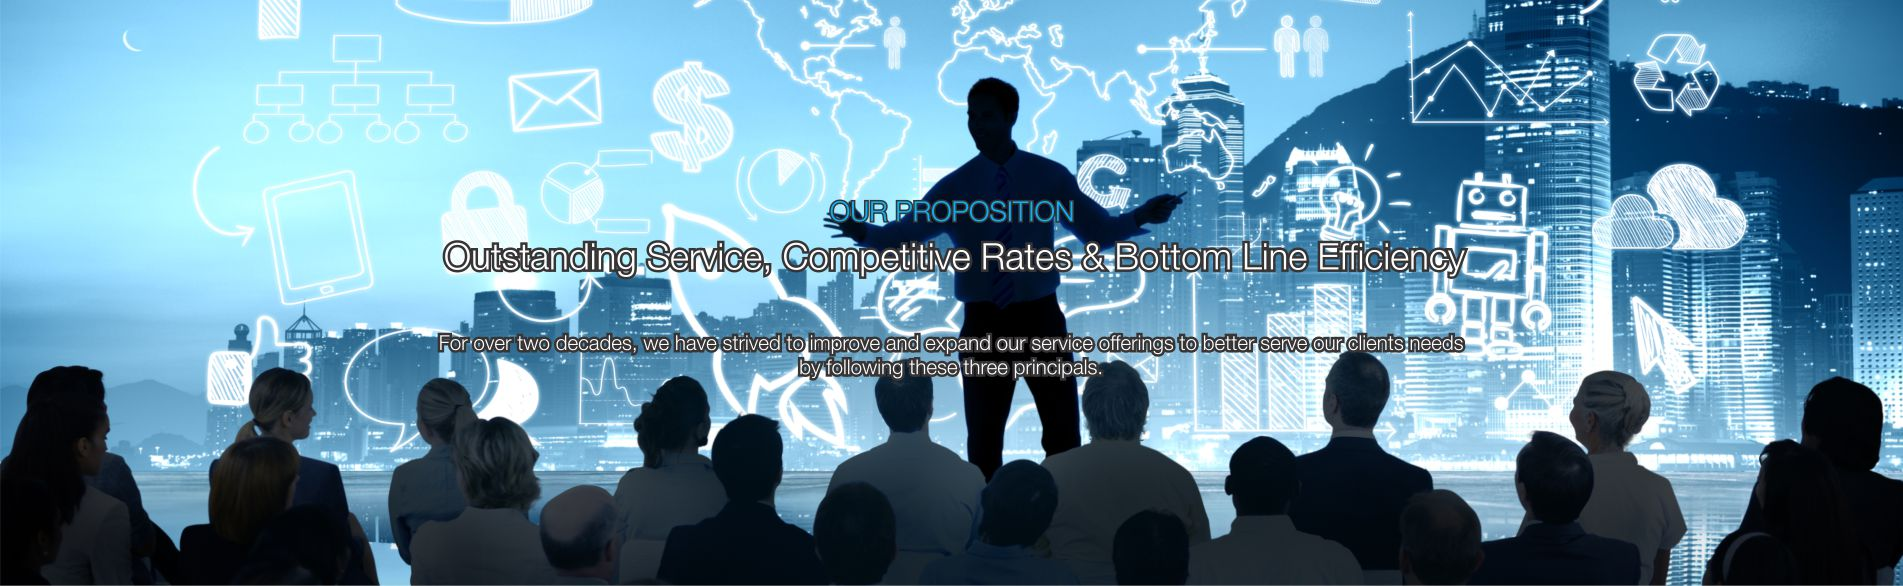 banner-proposition